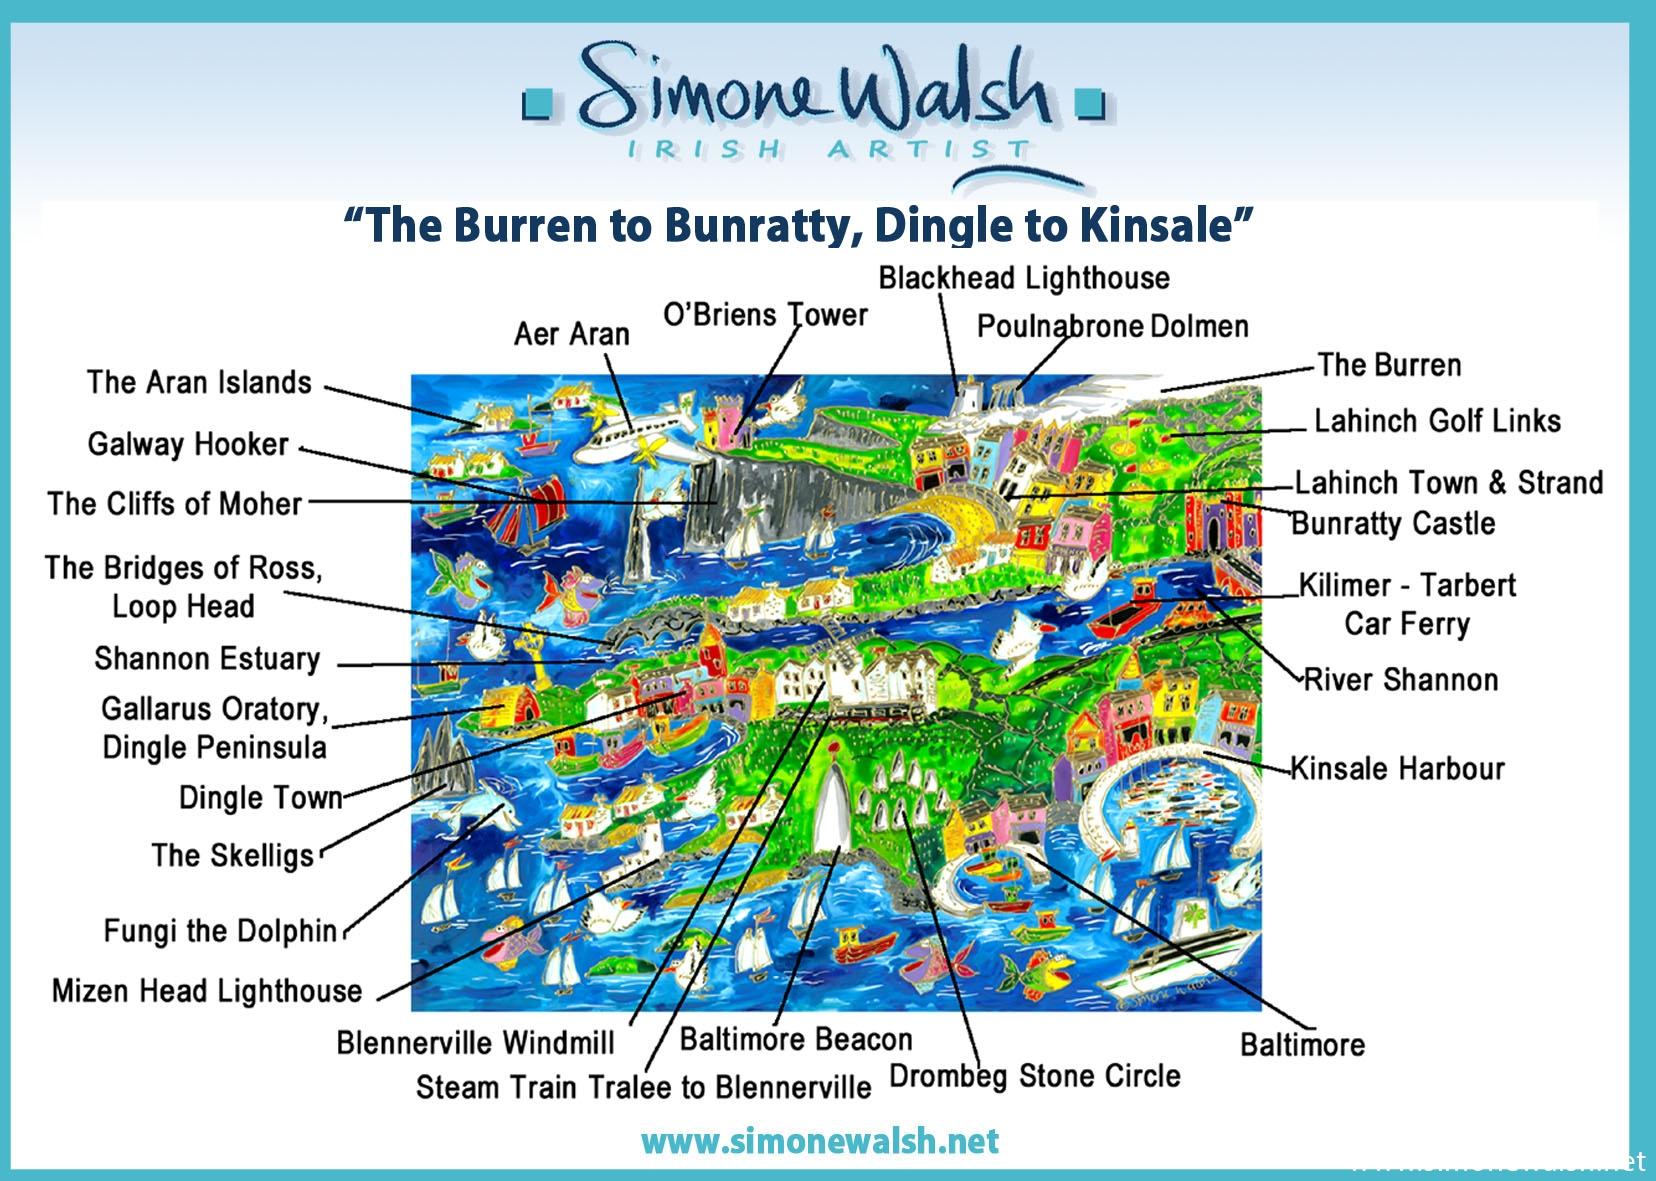 Dingle Map Of Ireland.The Burren To Bunratty Dingle To Kinsale